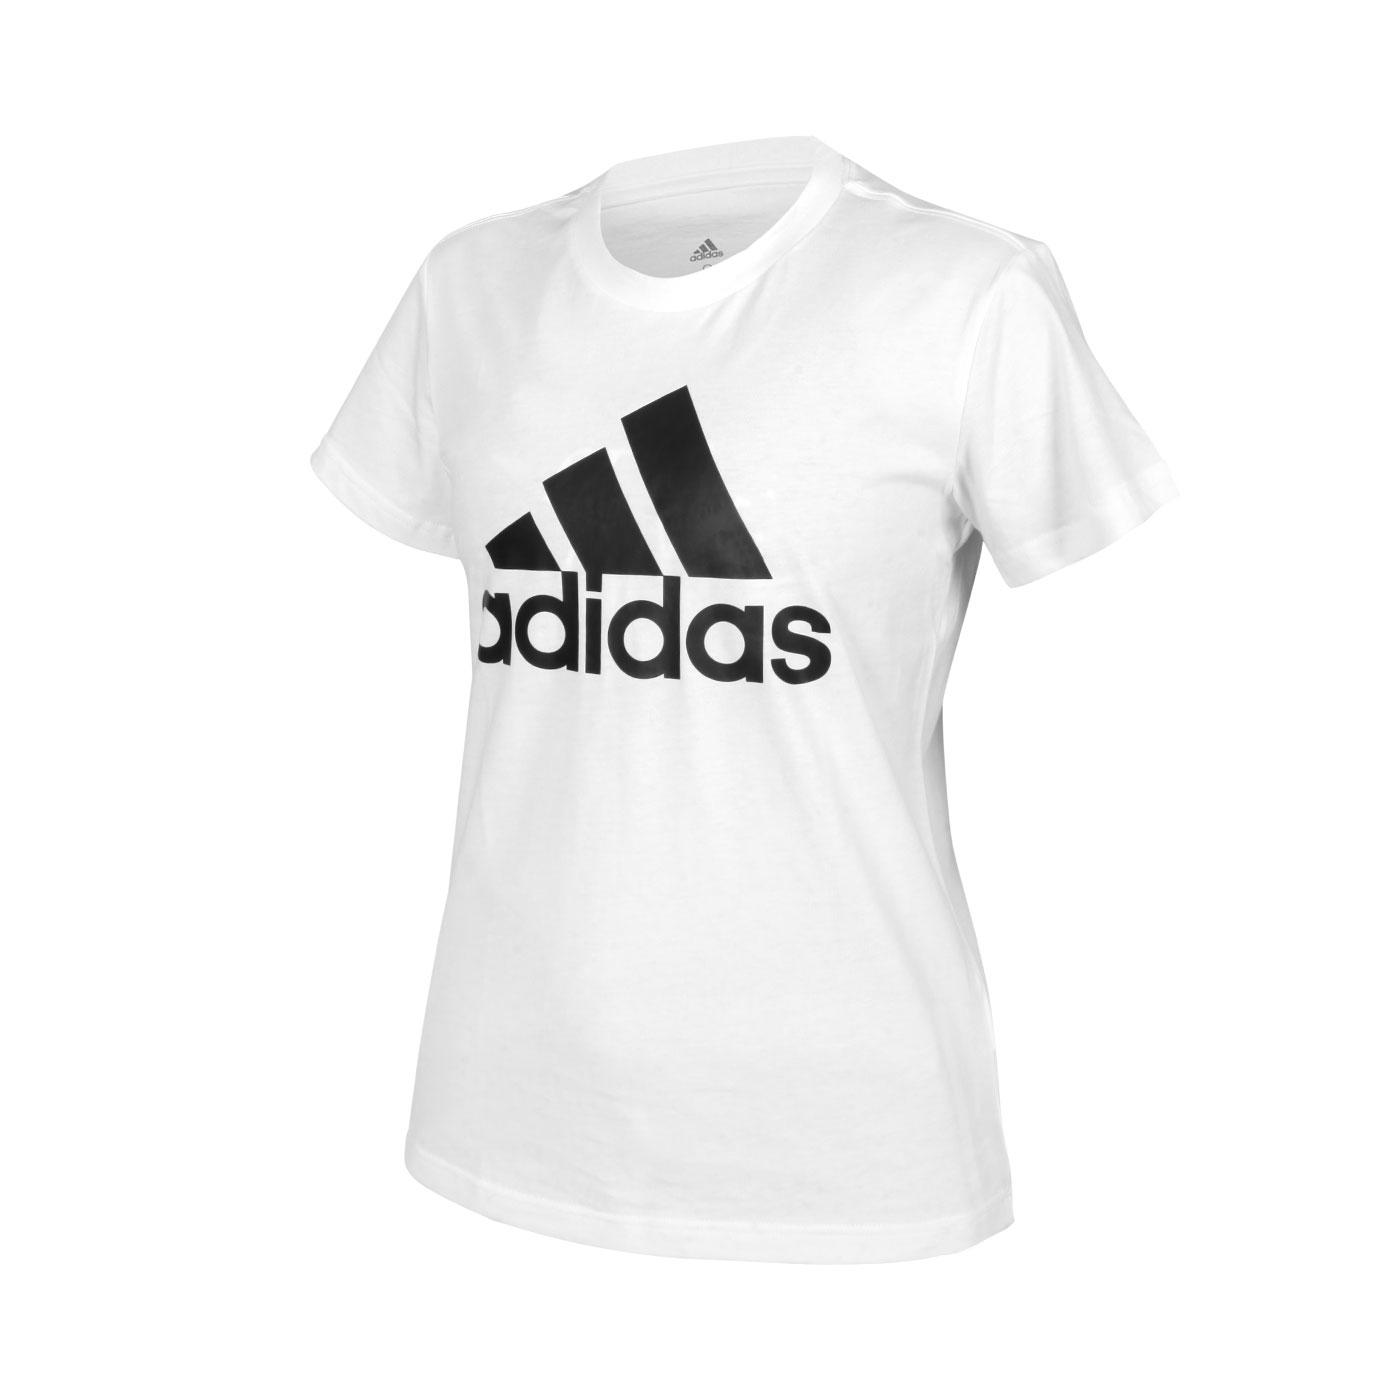 ADIDAS 女款短袖T恤 GL0649 - 白黑